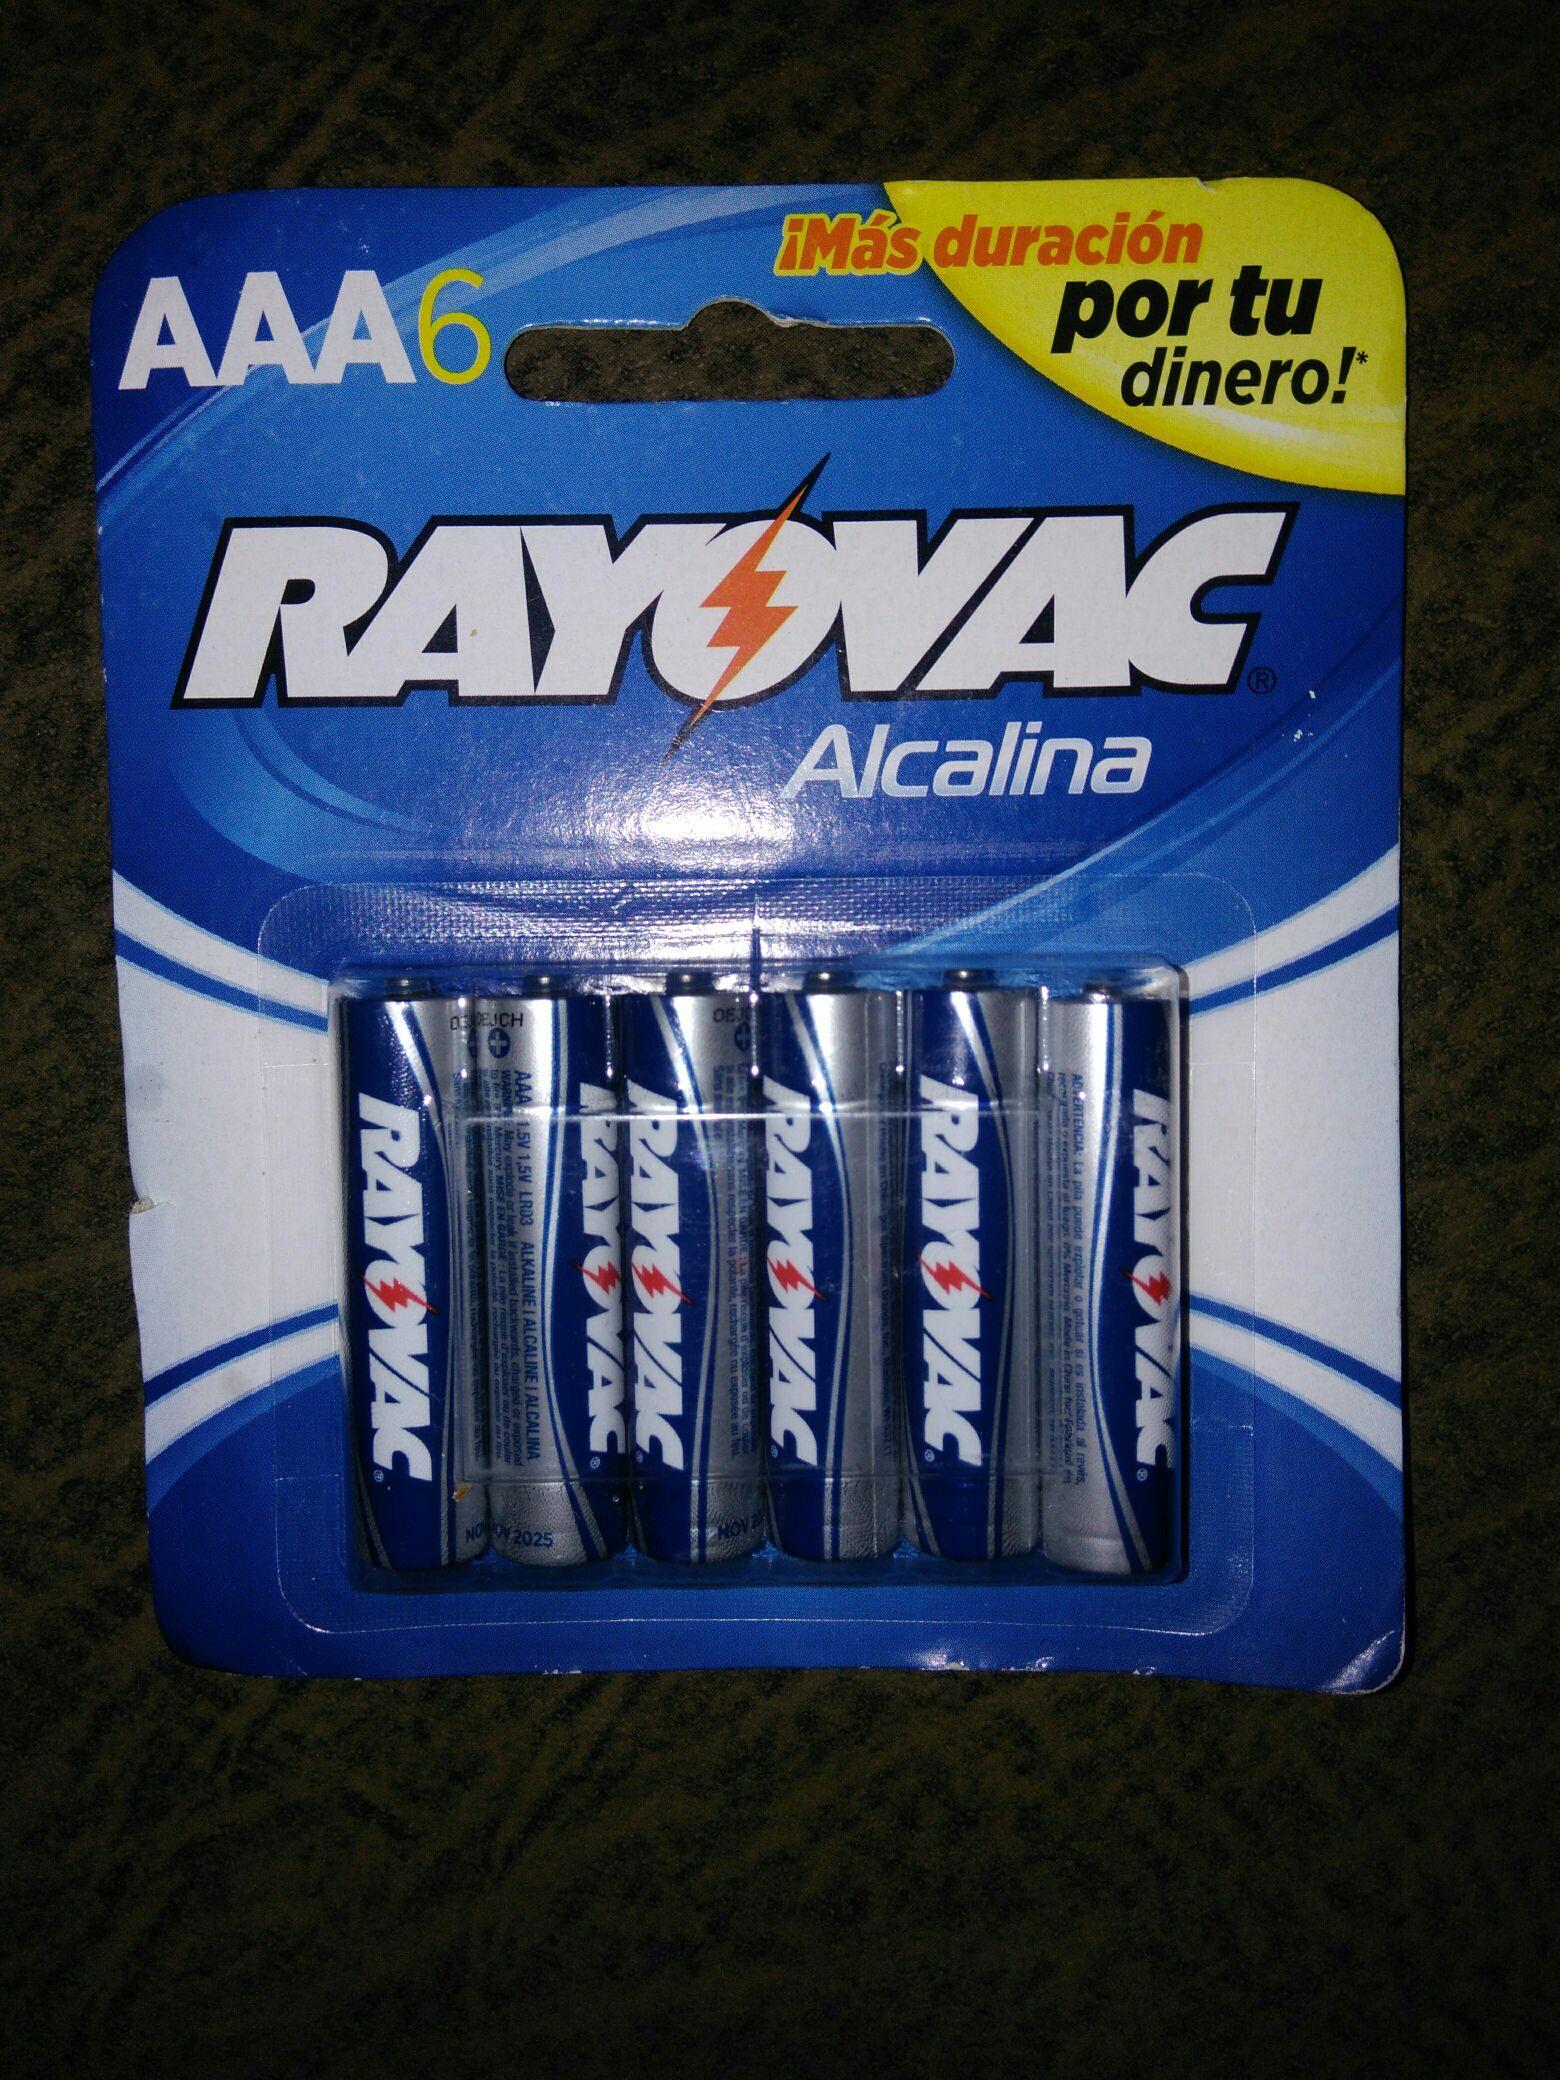 Bodega Aurrerá: pilas AAA Rayovac a $0.03